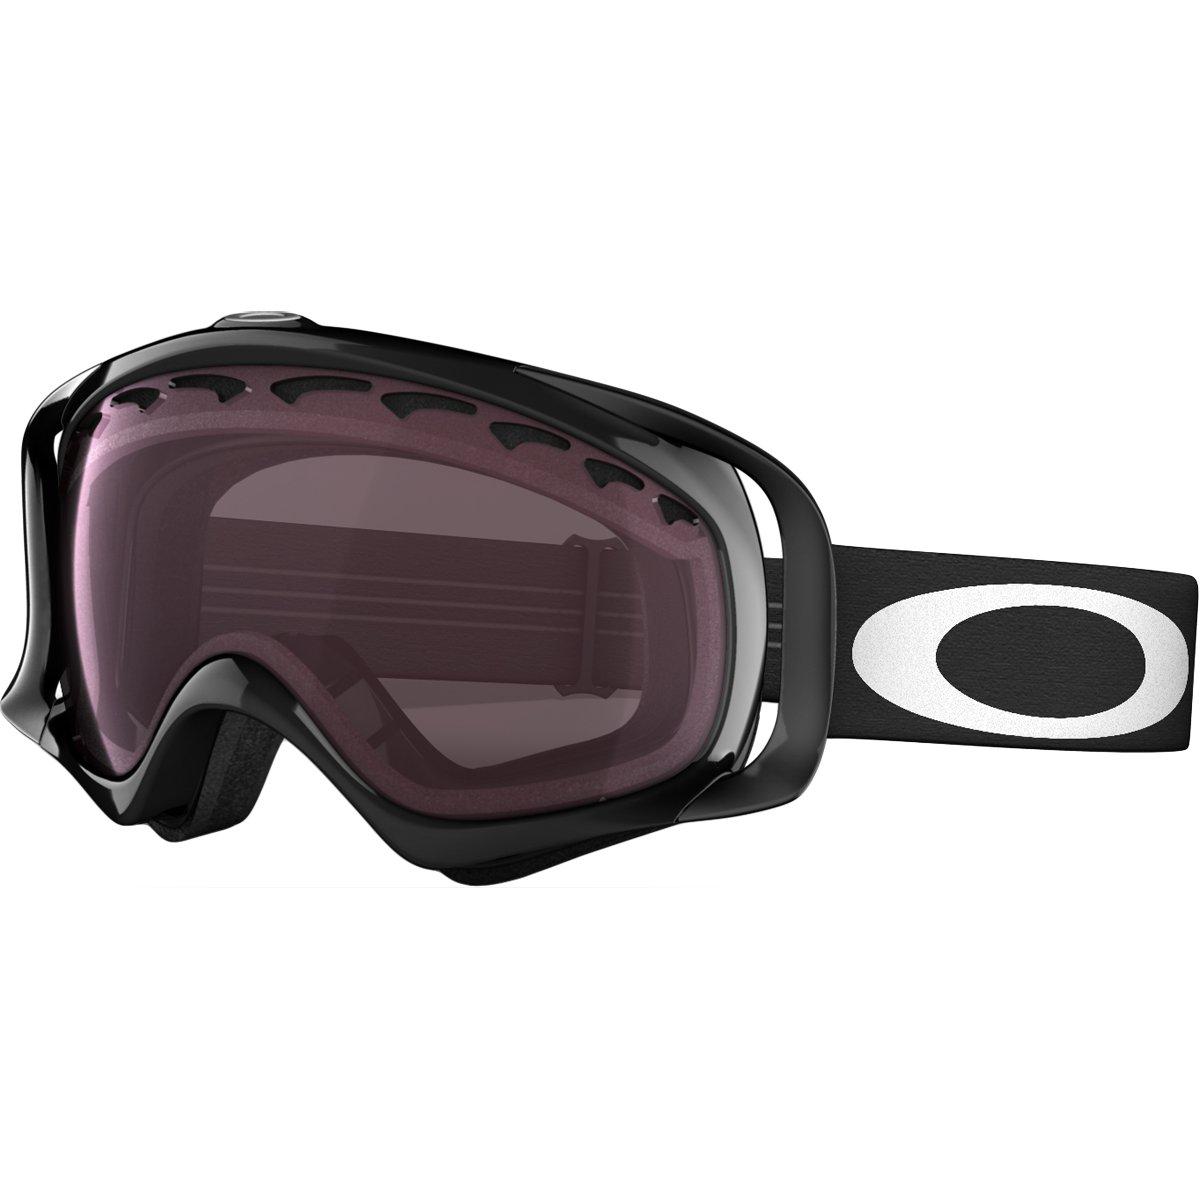 Interplas Unisex-Erwachsene Crowbar Skibrille, Jet Black, EL. Adjustable